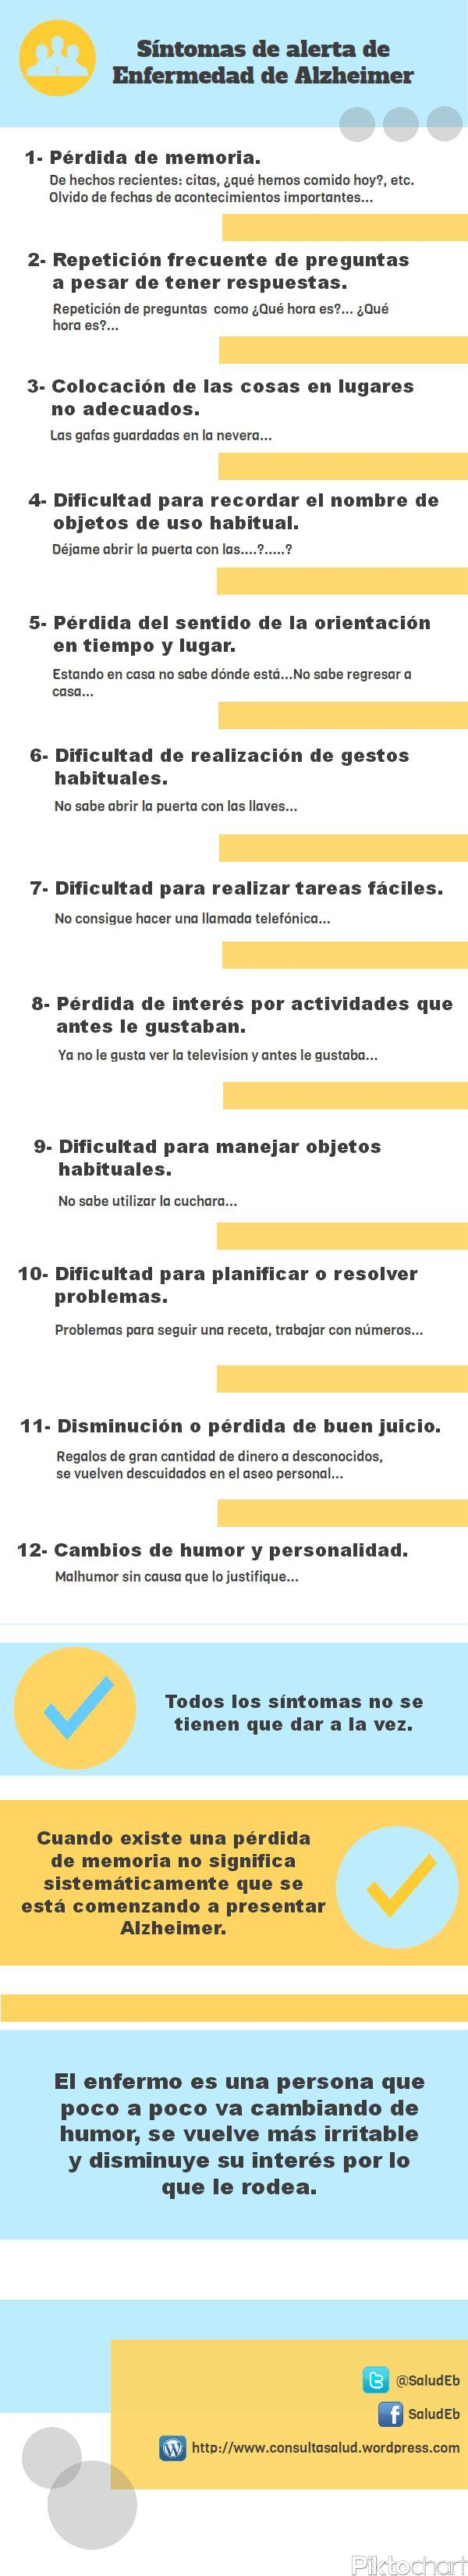 Síntomas del Alzheimer Alexa Santillan